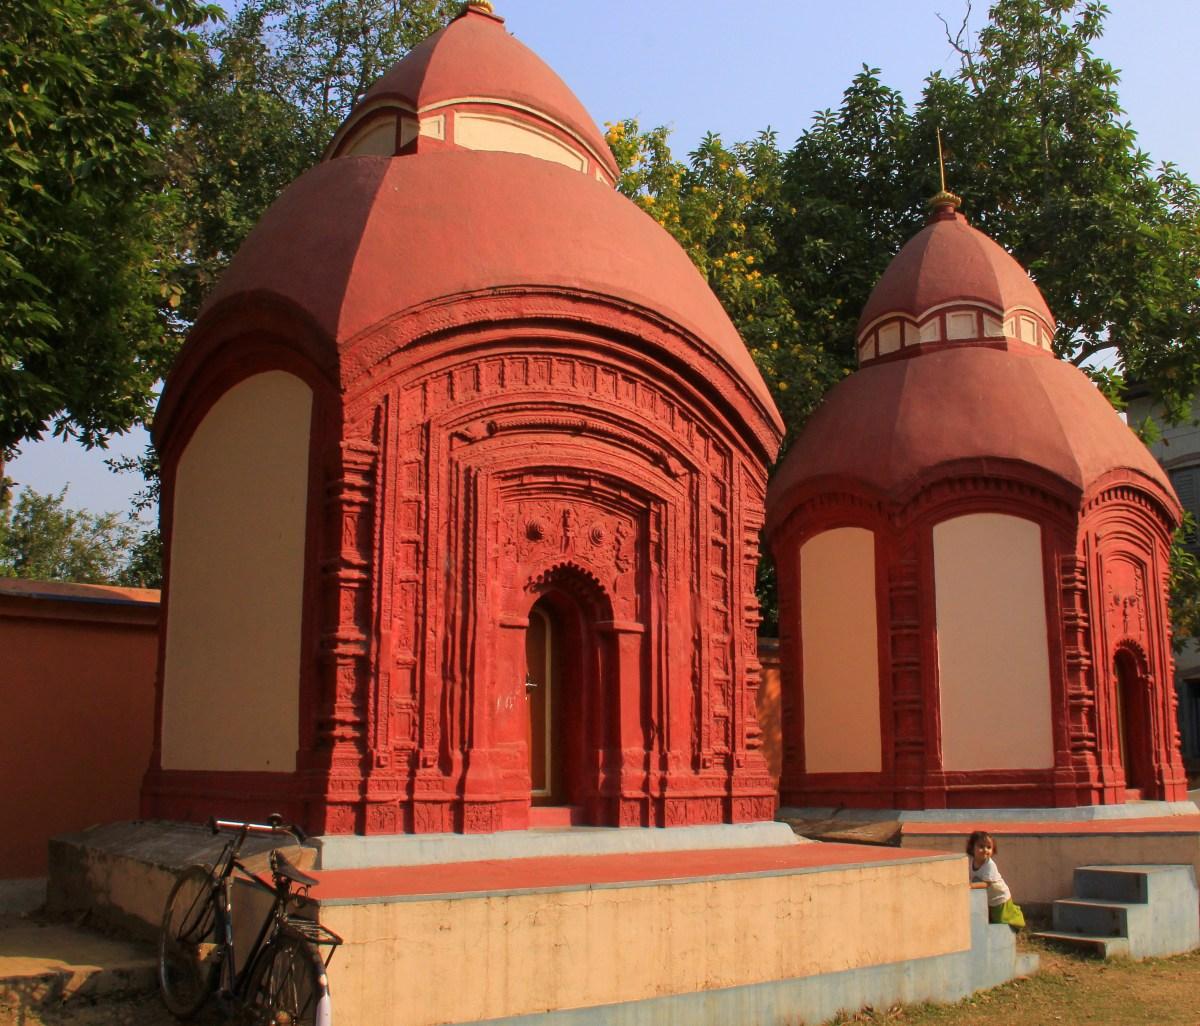 Terracotta temples of Amadpur Baithakkhana